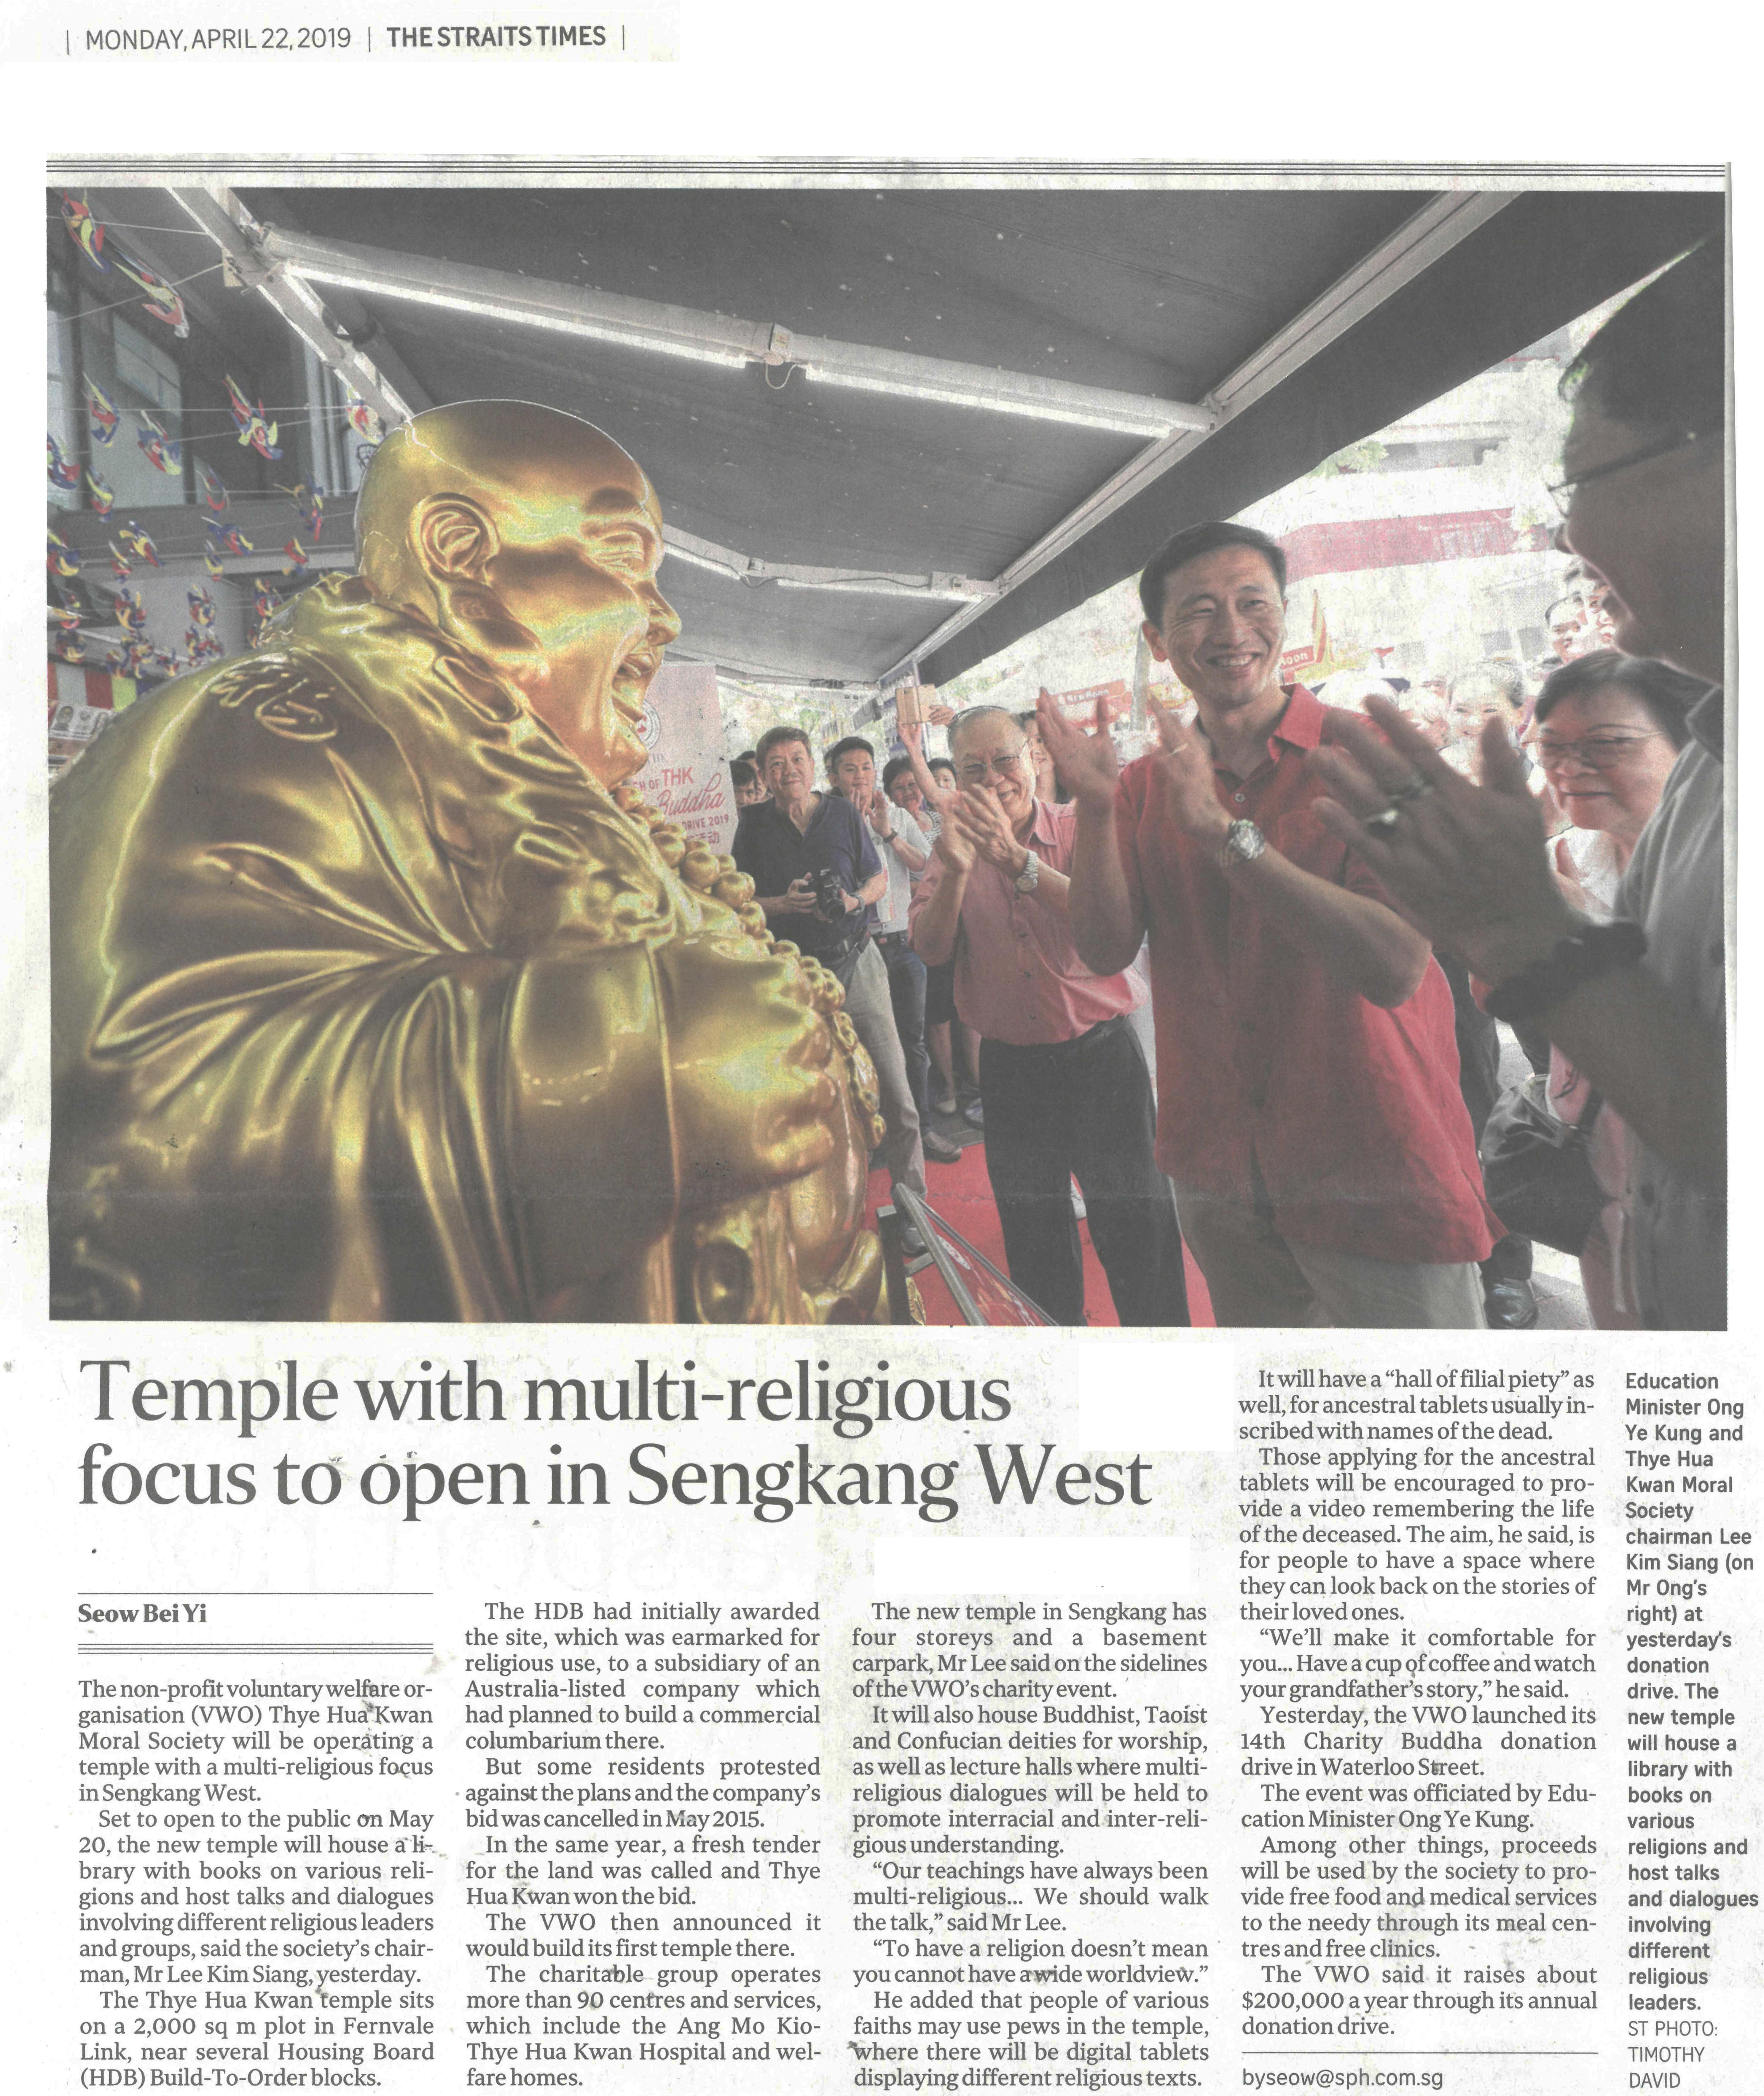 THK-Charity-Buddha-&-THK-Temple_22-Apr-2019_Straits-Times